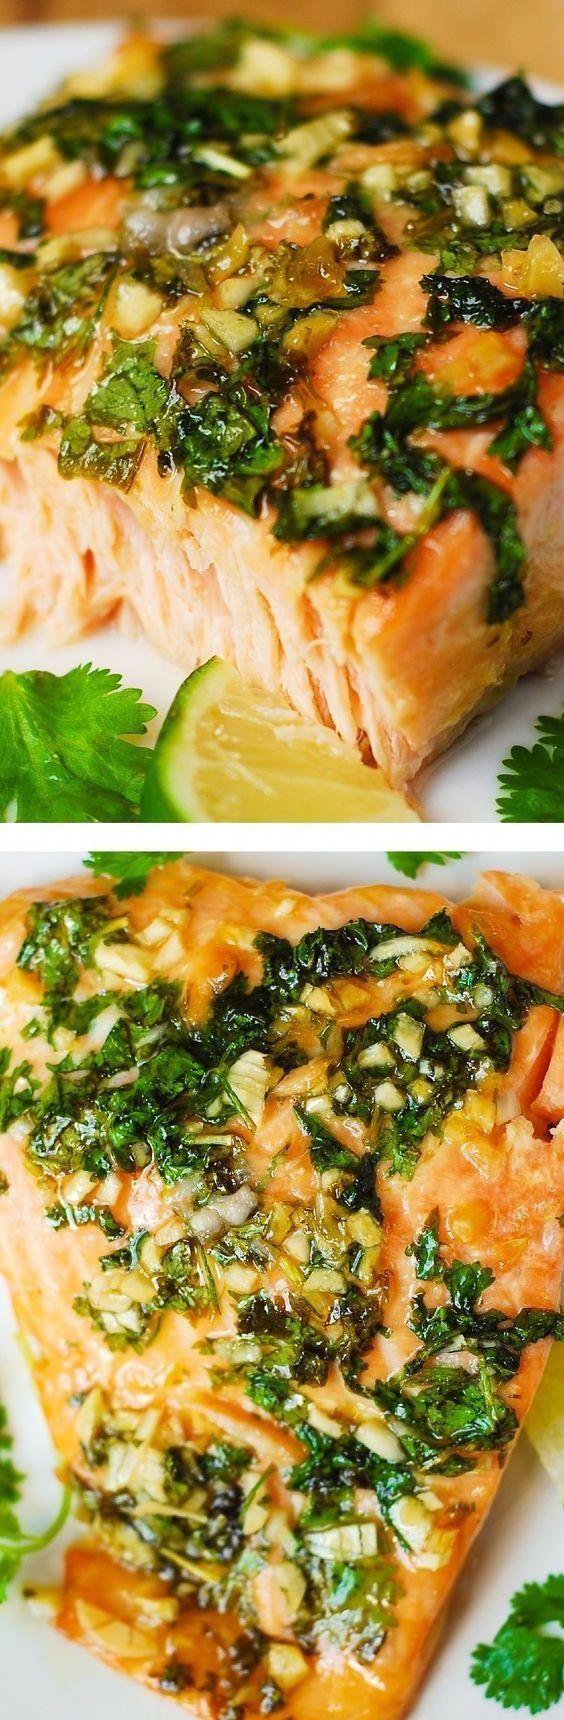 Photo of Cilantro-Lime Honey Garlic Baked Salmon #taliparecipes